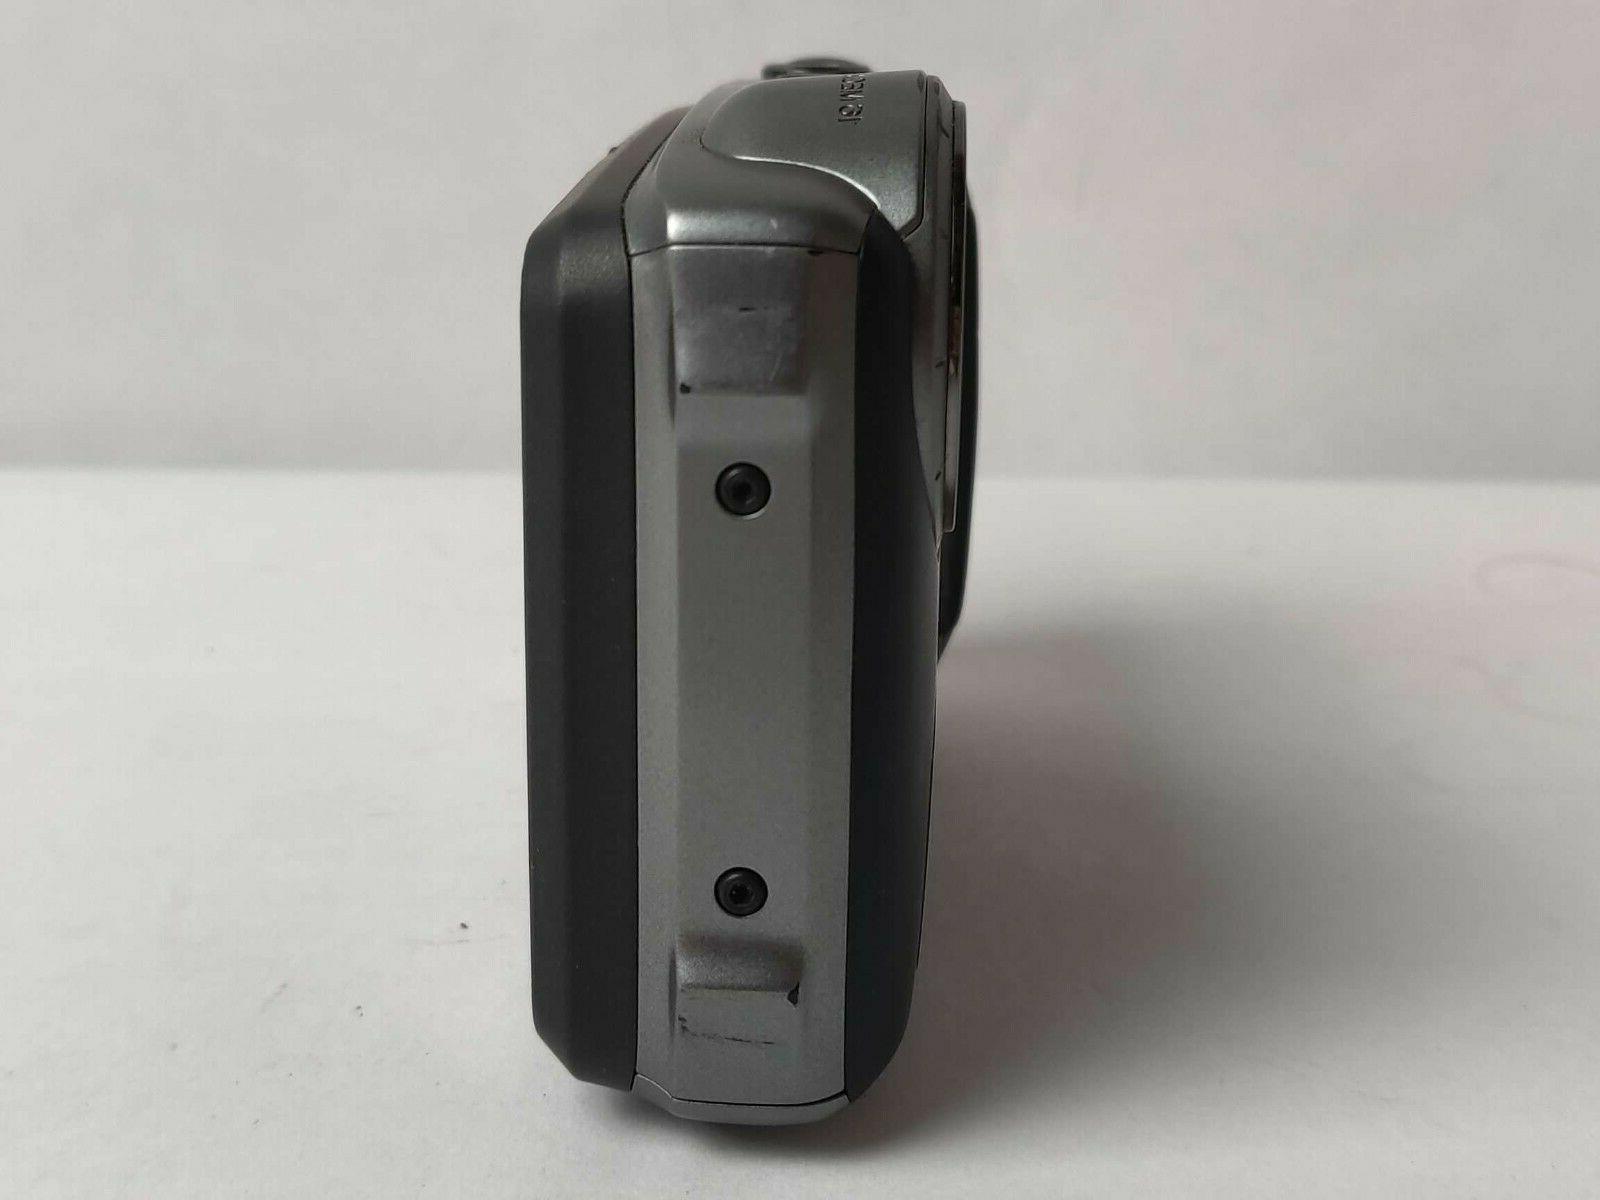 No Battery Fujifilm FinePix XP135 Rugged Waterproof Action Camera